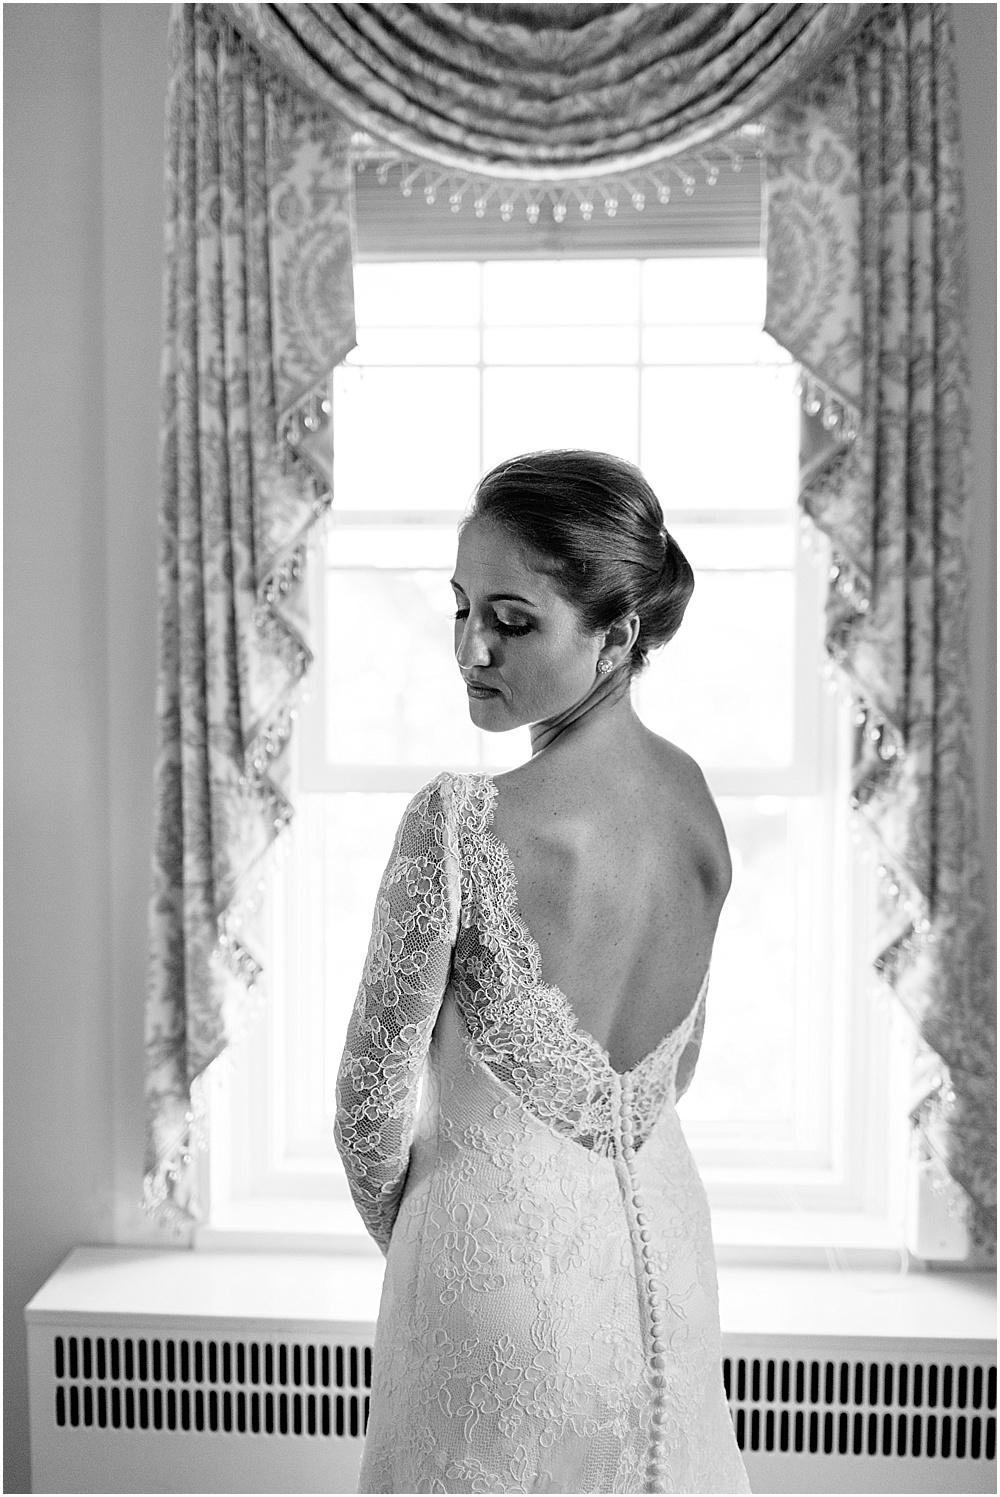 Vane_Baltimore_Country_Club_Wedding_Baltimore_Wedding_Photographer_0023